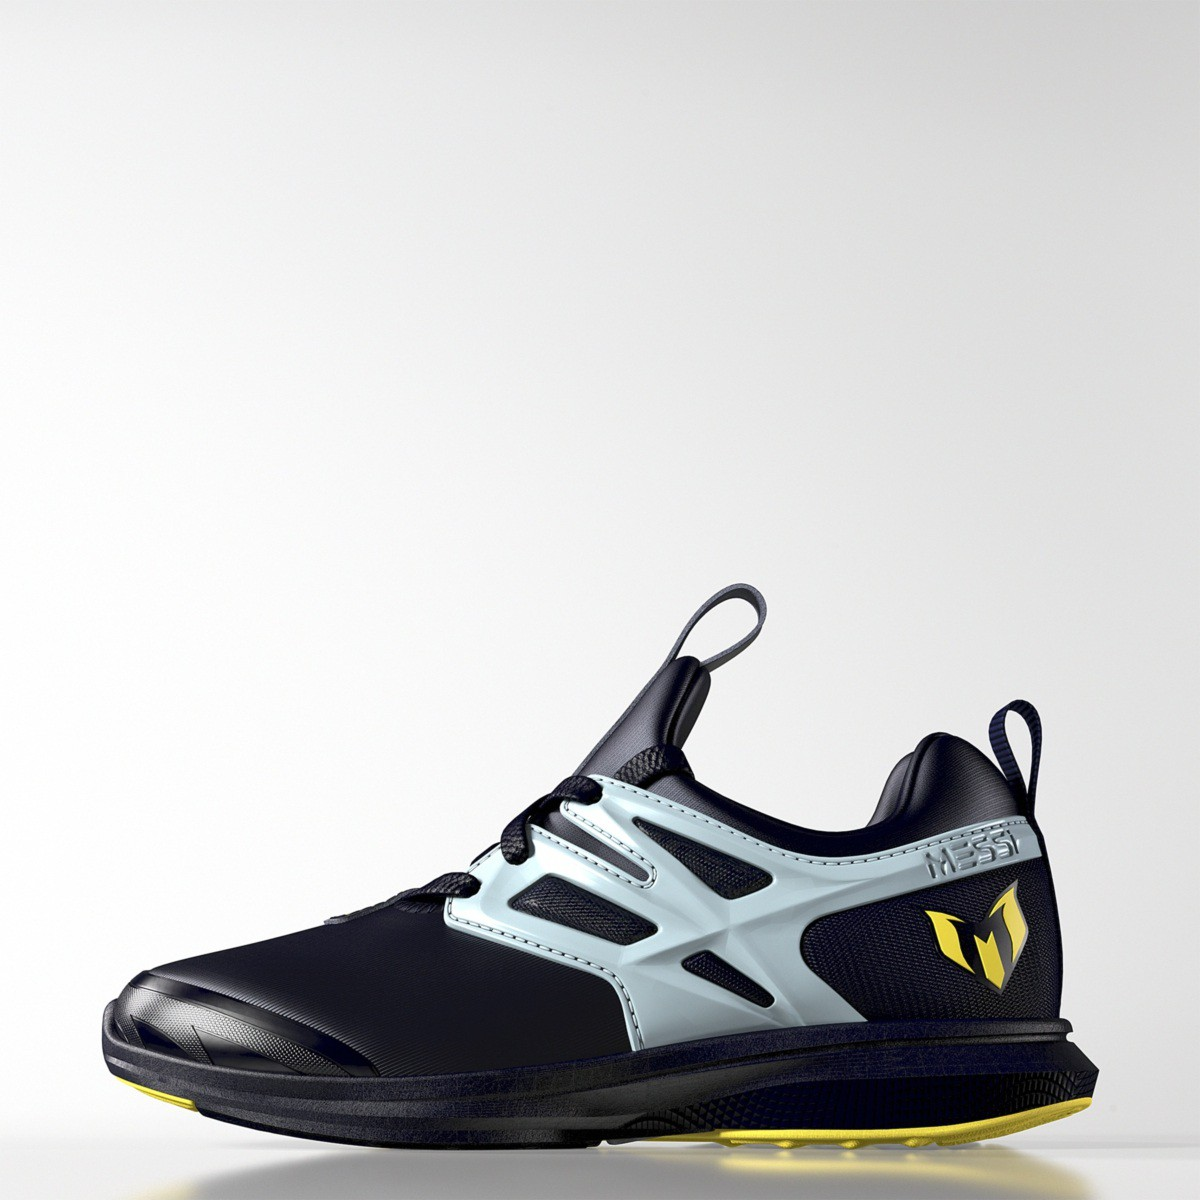 eb837c4b93a Dětská fitness obuv adidas Messi K